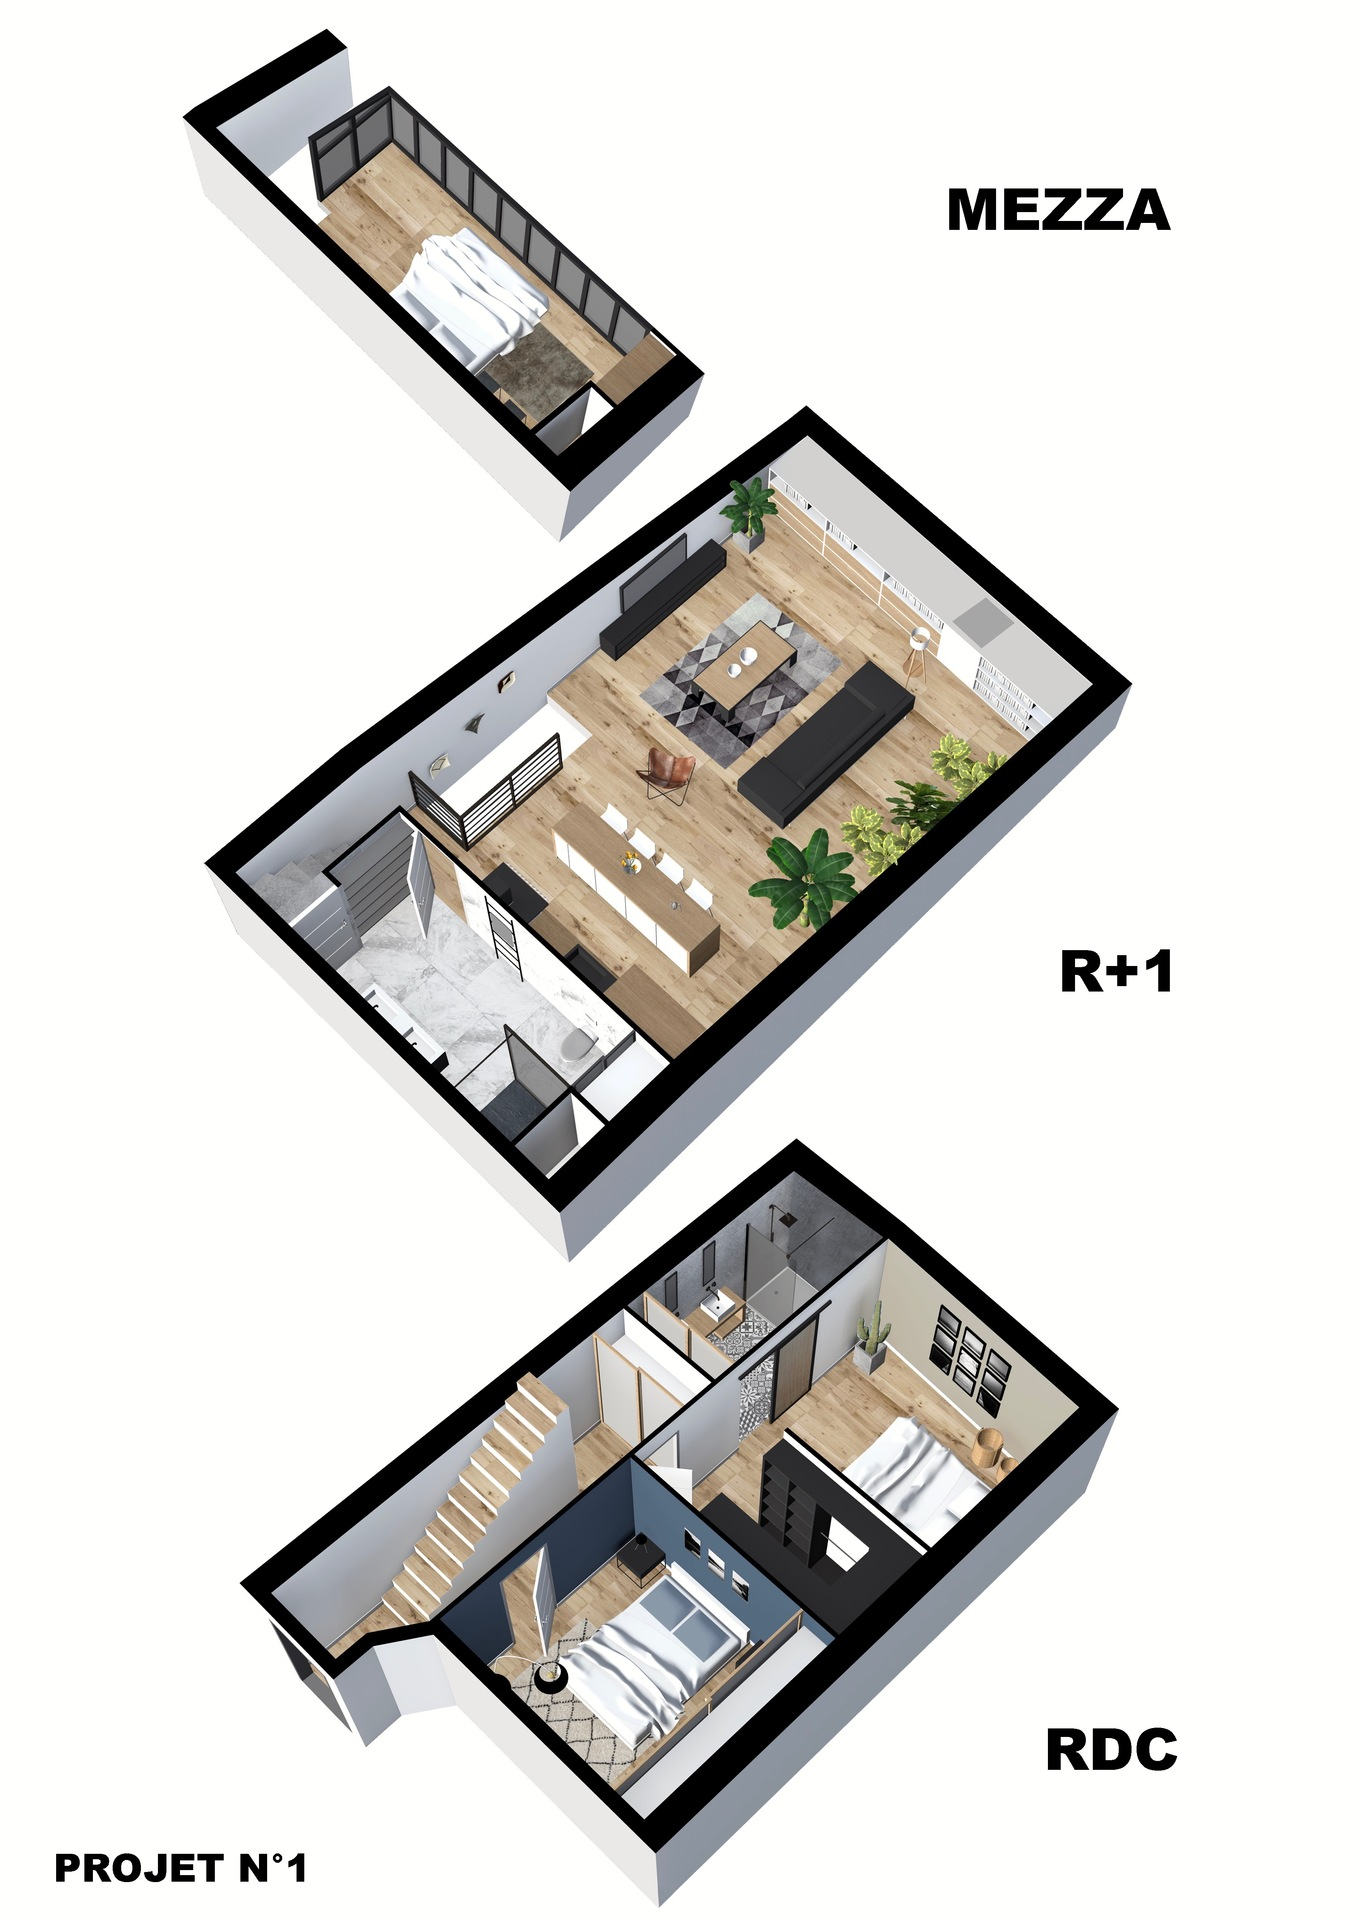 Vente appartement duplex Antibes 06600 T4 90m²_projet 1